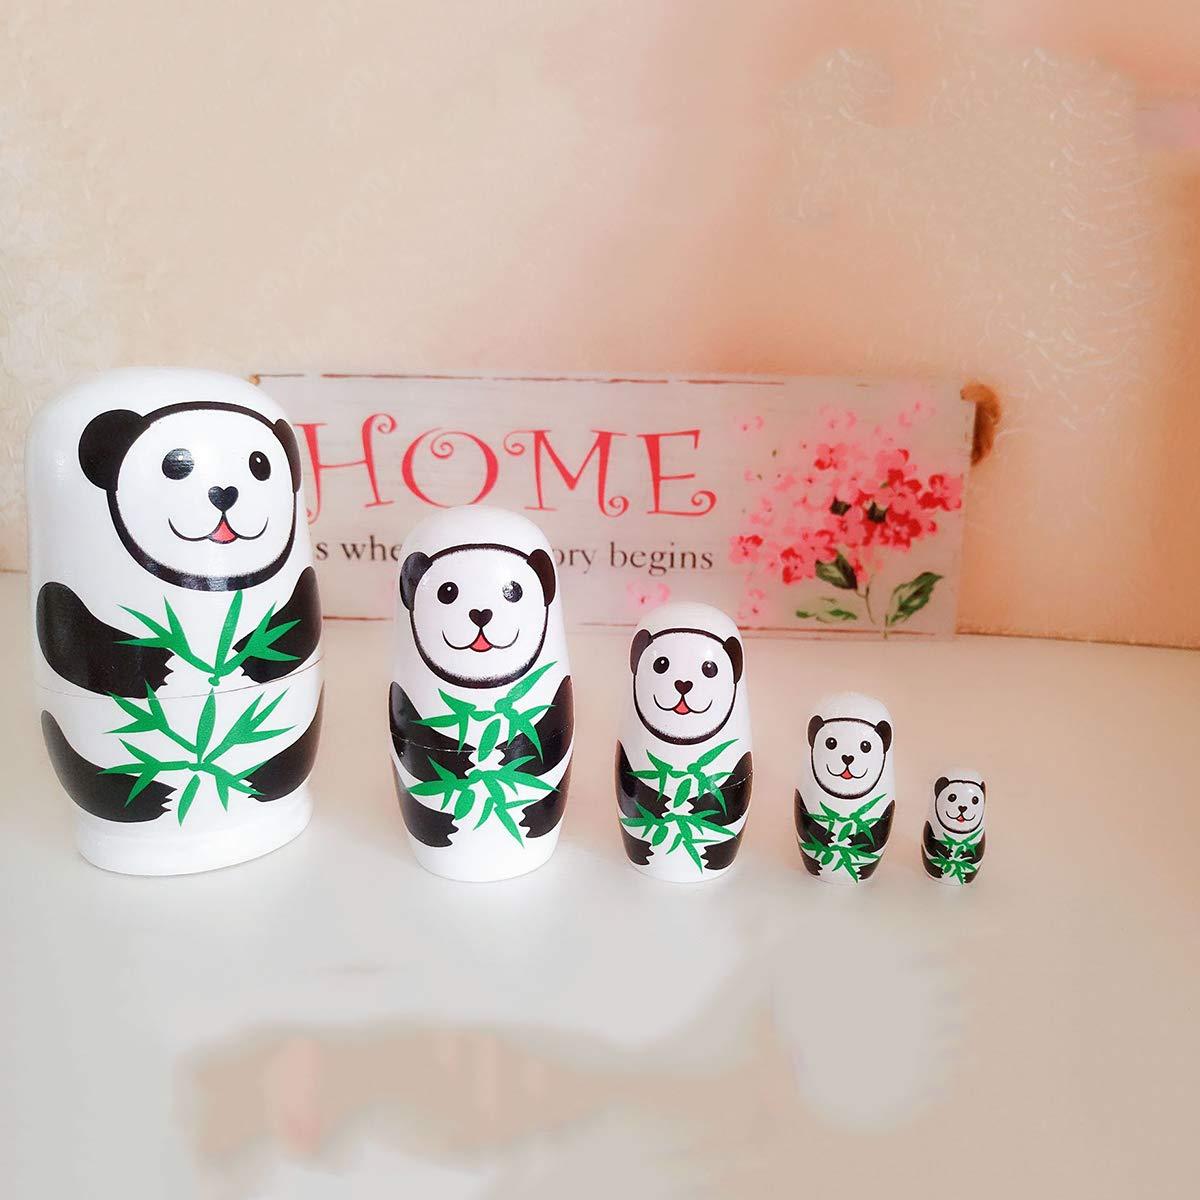 TOYANDONA 5pcs Russian Nesting Dolls Matryoshka Cute Panda Wood Stacking Nested Wooden Toy for Kids Birthday Gift Home Decoration